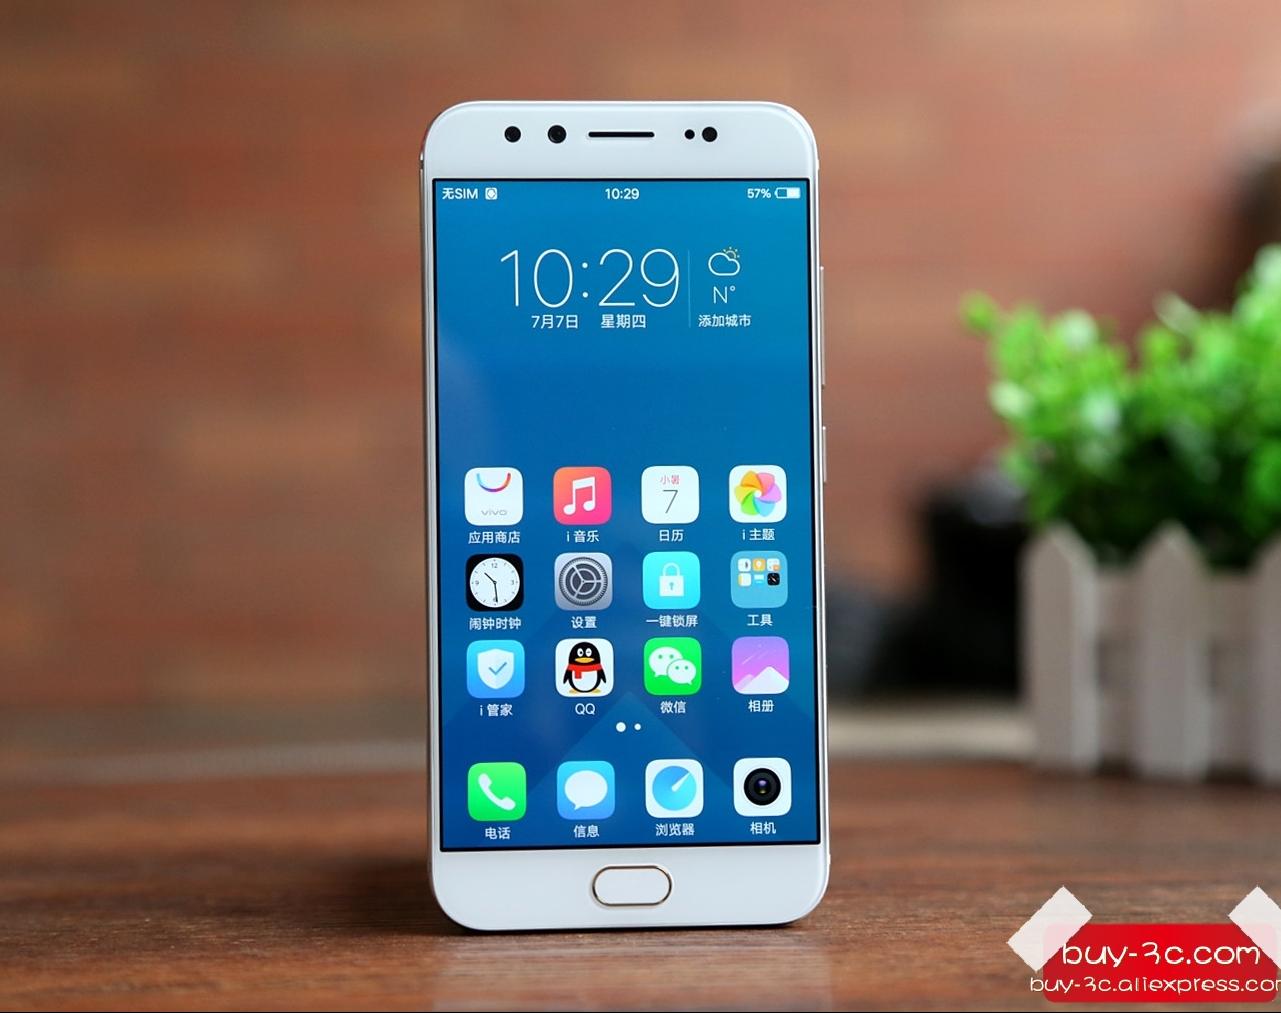 VIVO X9Plus Snapdragon 653 Dual SIM card 6GB RAM 64GB ROM 5.88 Inch 4G LTE Google Play Front Dual Camera (20MP+8MP) Front flash(China (Mainland))